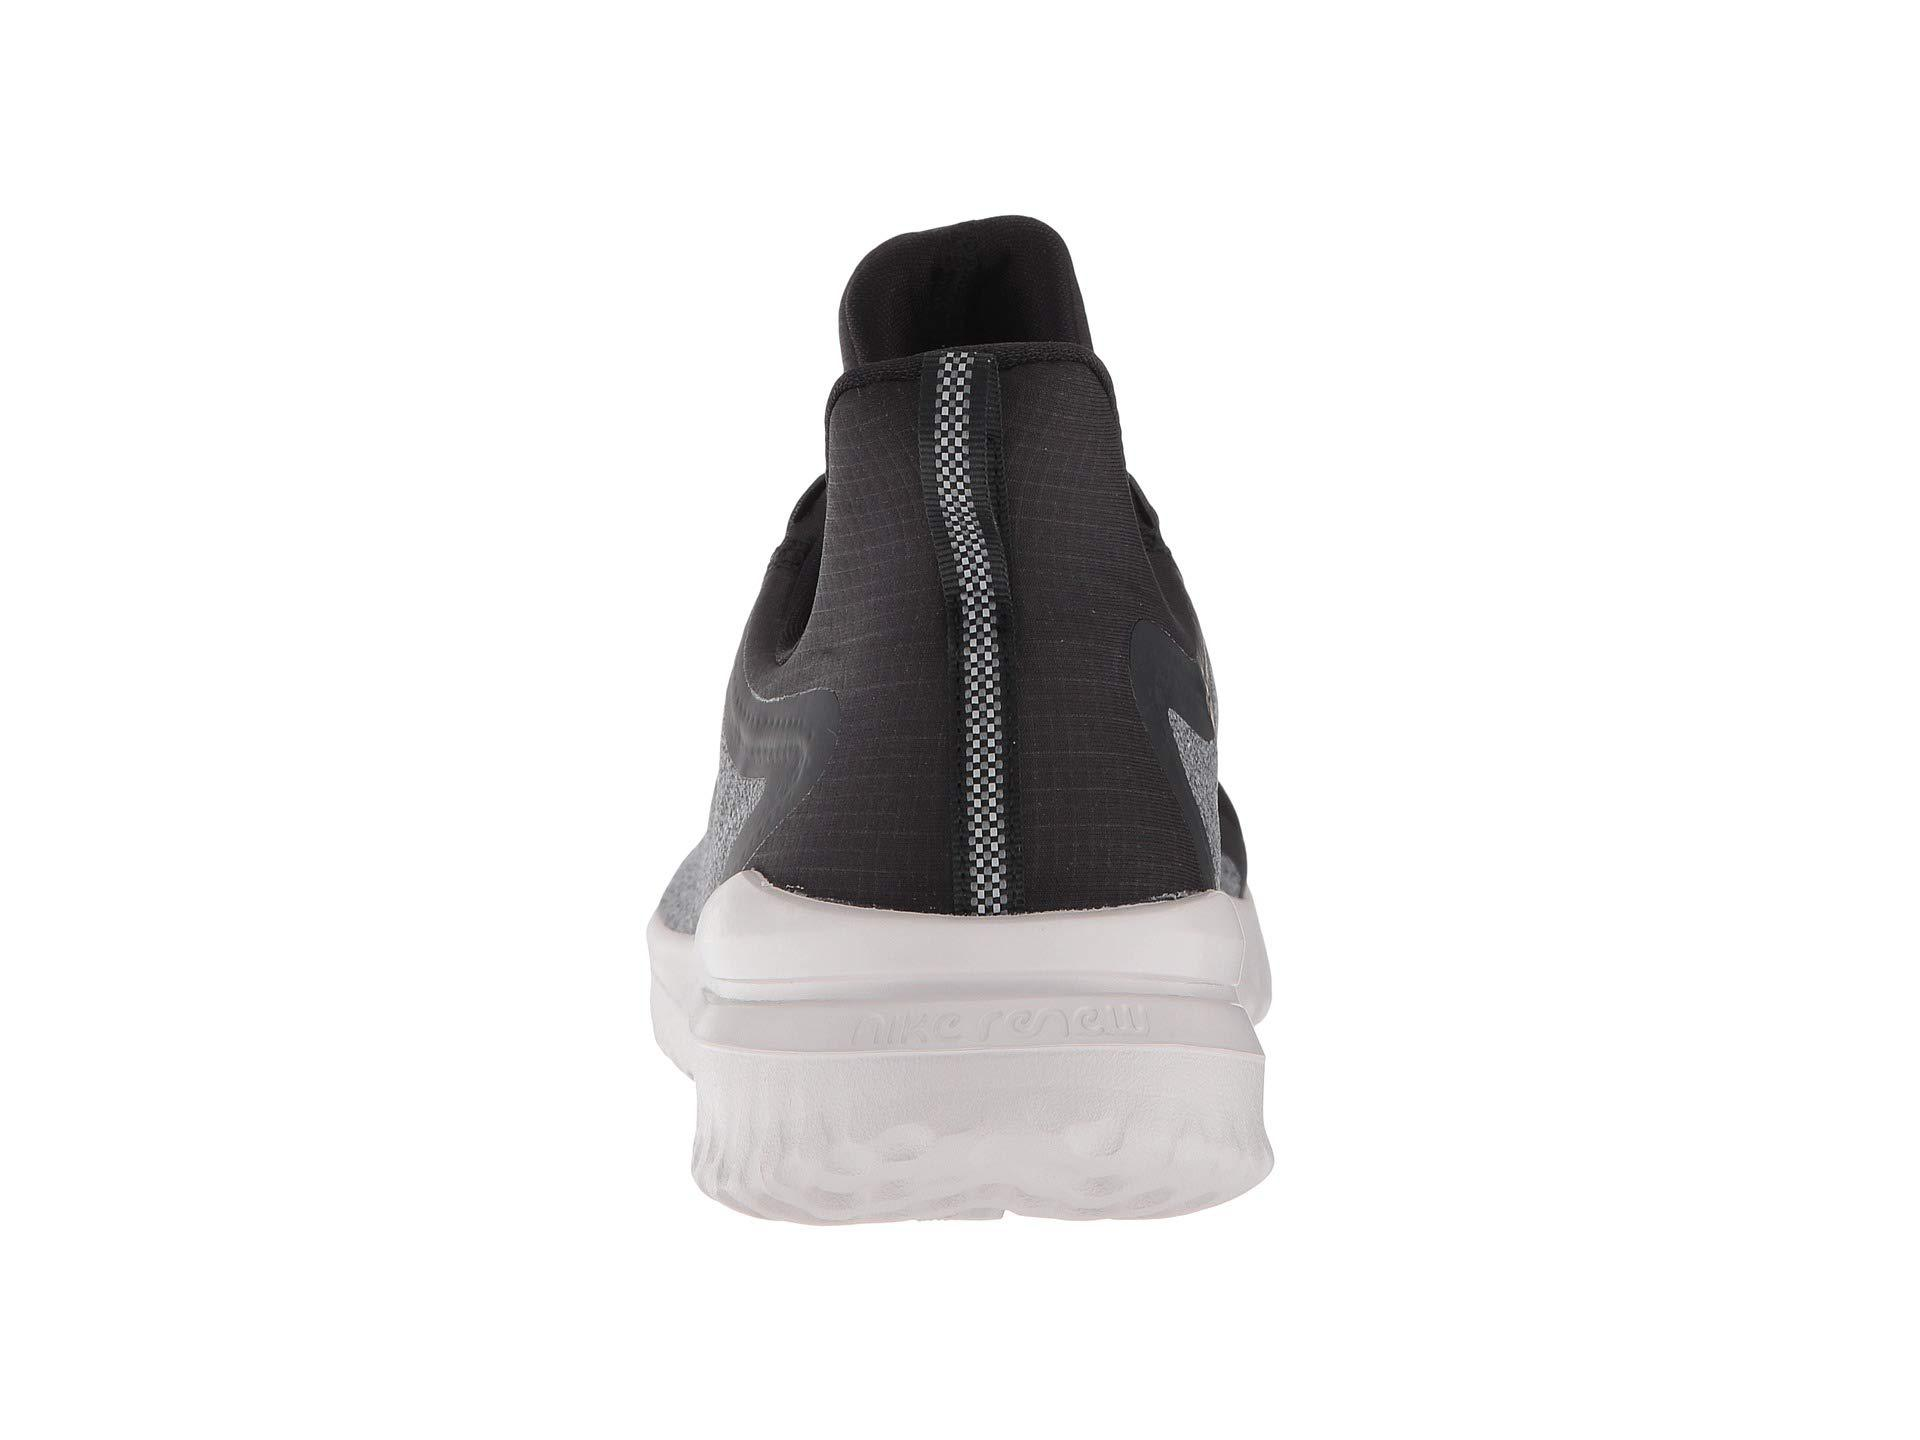 e8d62a95fdd Lyst - Nike Renew Rival Shield (black metallic Silver cool Grey) Men s  Running Shoes in Metallic for Men